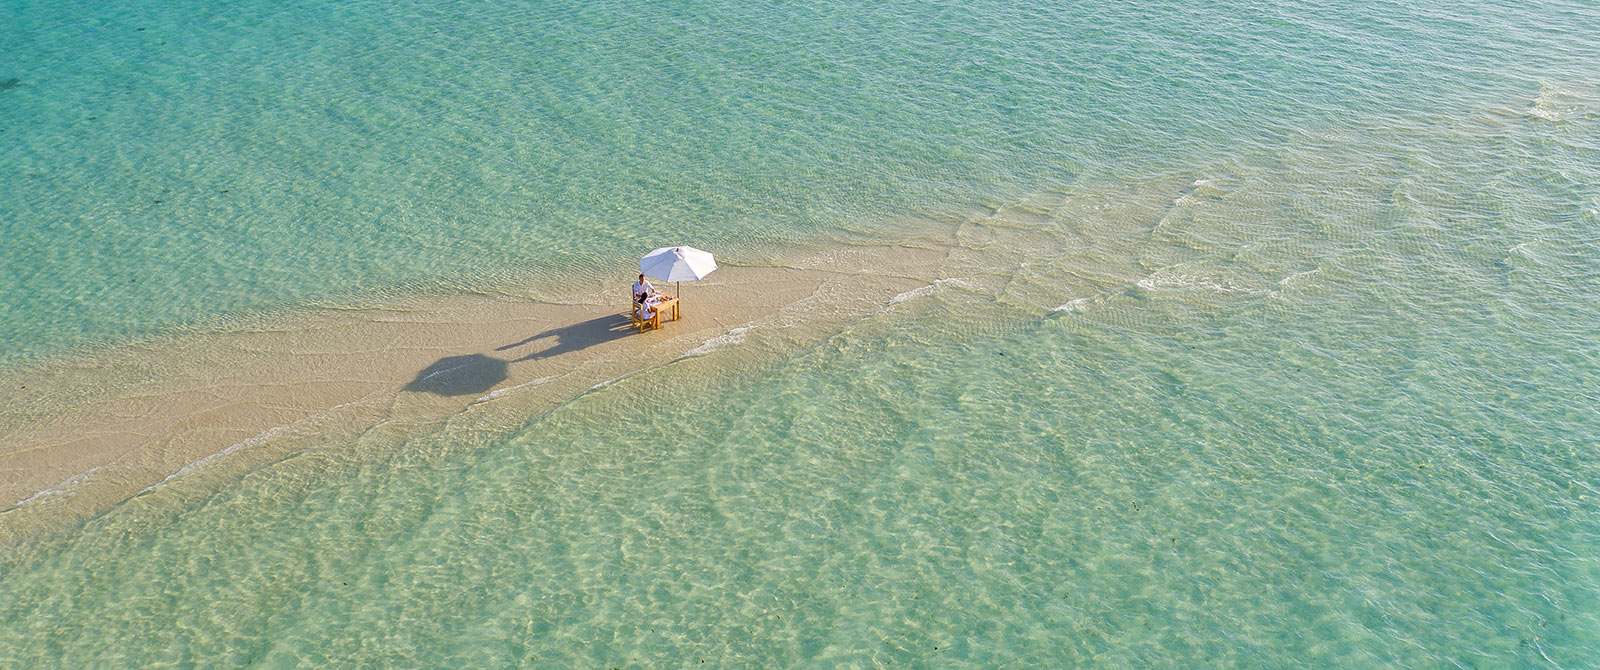 Soneva Jani Resort - Private Sandbank Ocean Dining - Maldives Overwater Bungalow Vacation